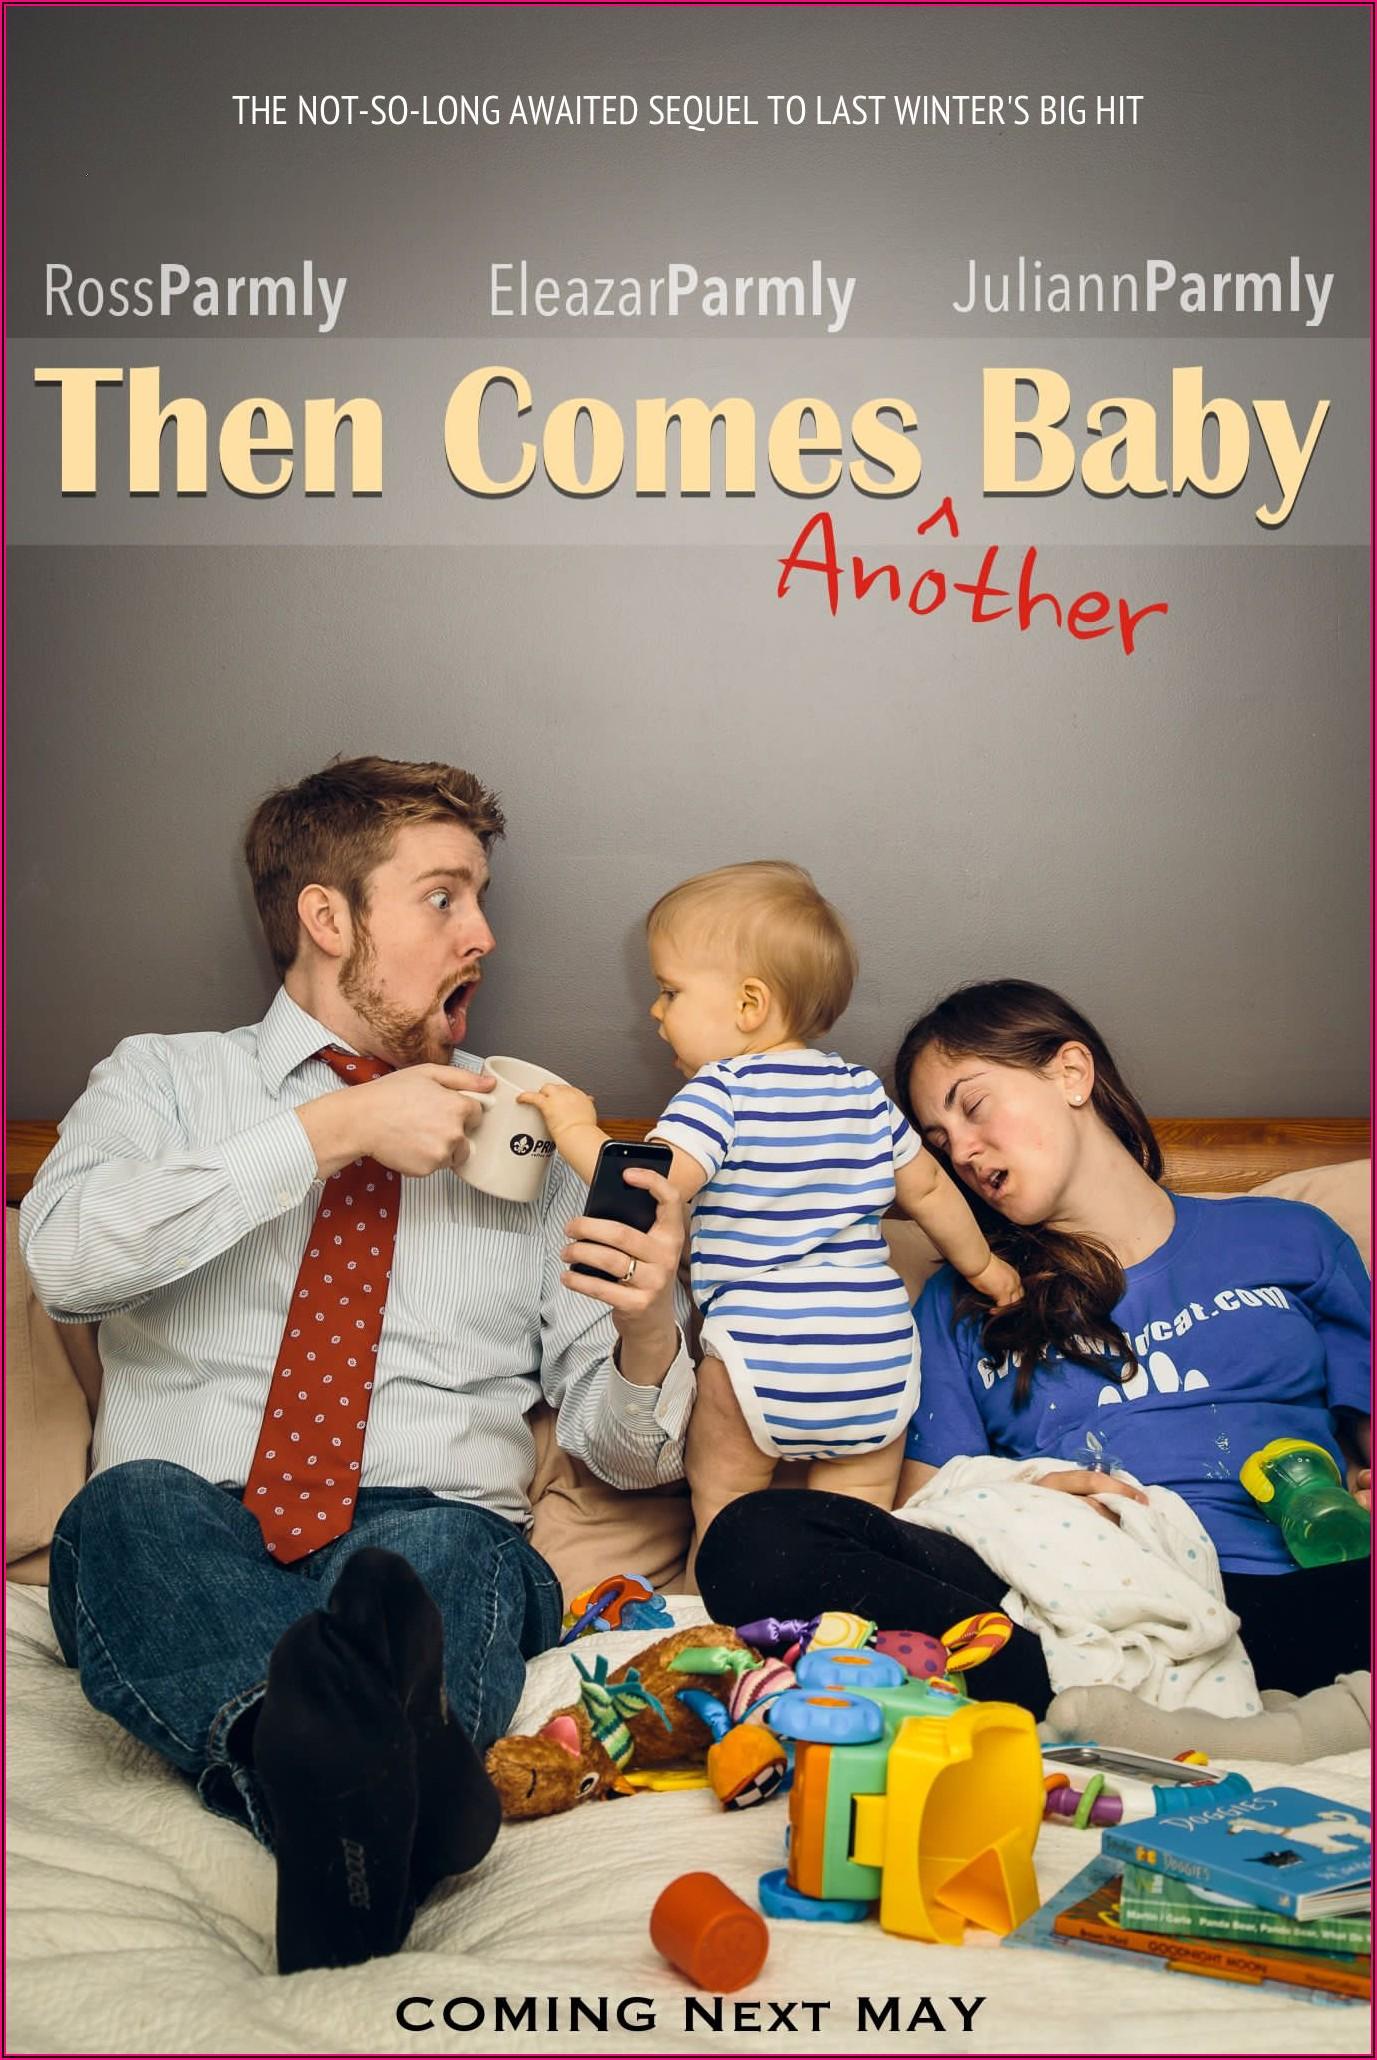 2nd Pregnancy Announcement Wording